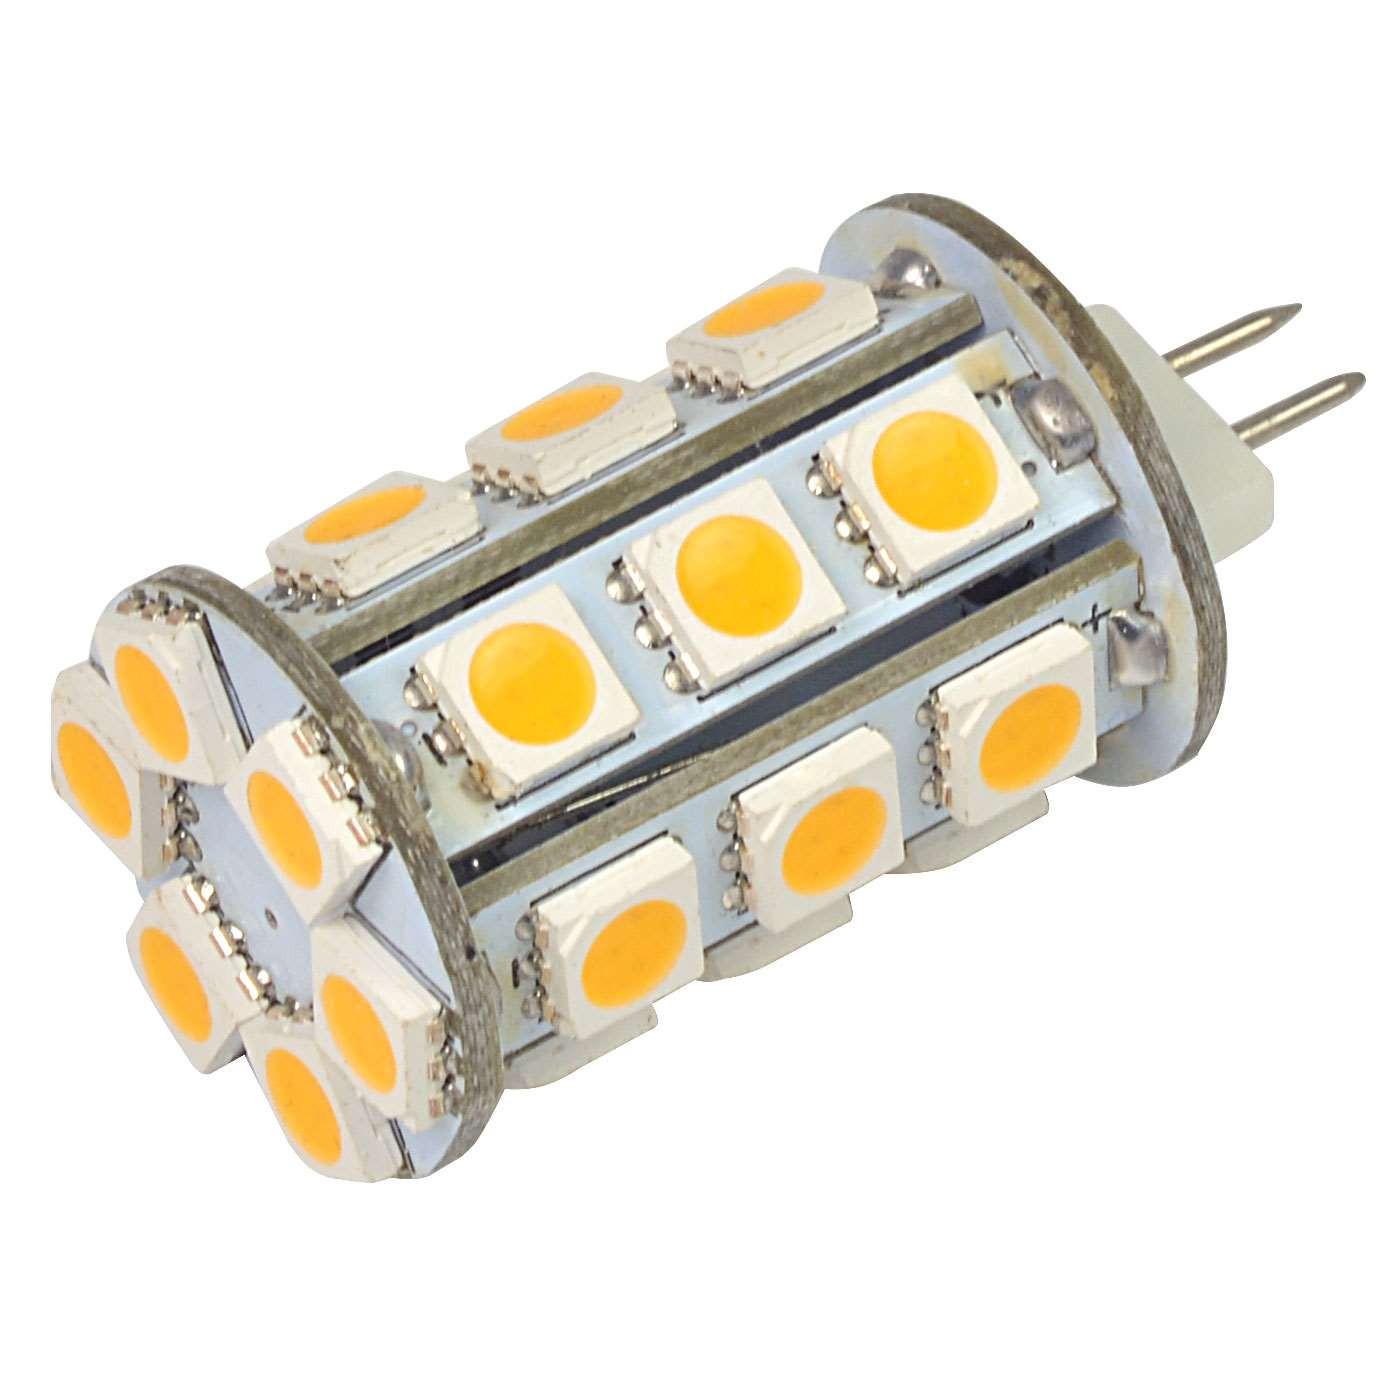 MENGS® G4 4W LED Light 24x 5050 SMD LEDs LED Bulb In Warm White Energy-Saving Lamp